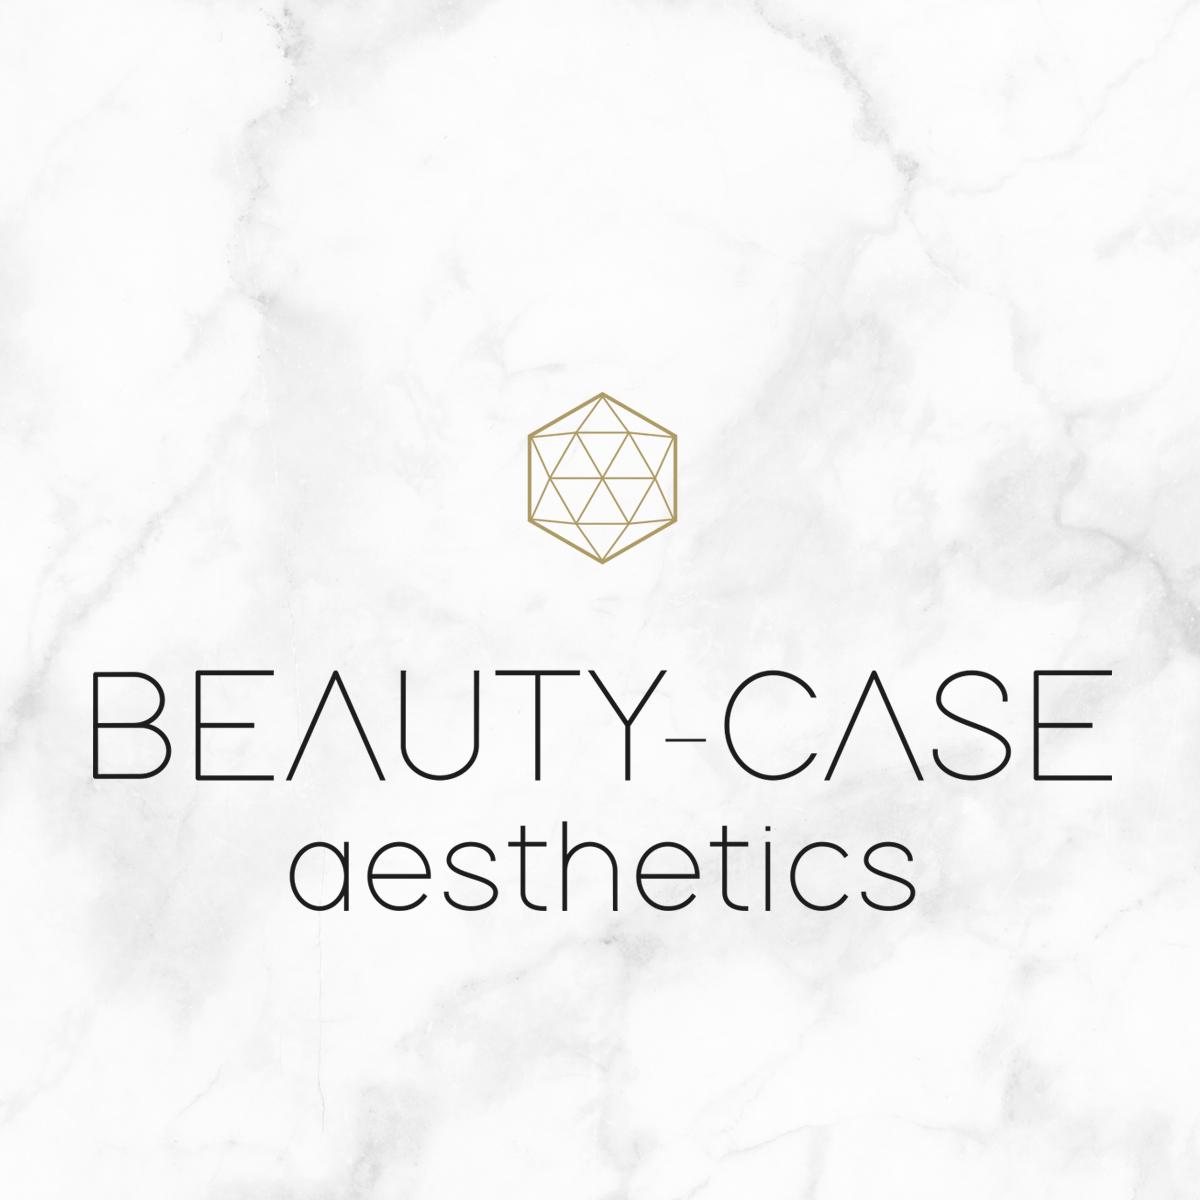 logo beauty case aesthetics